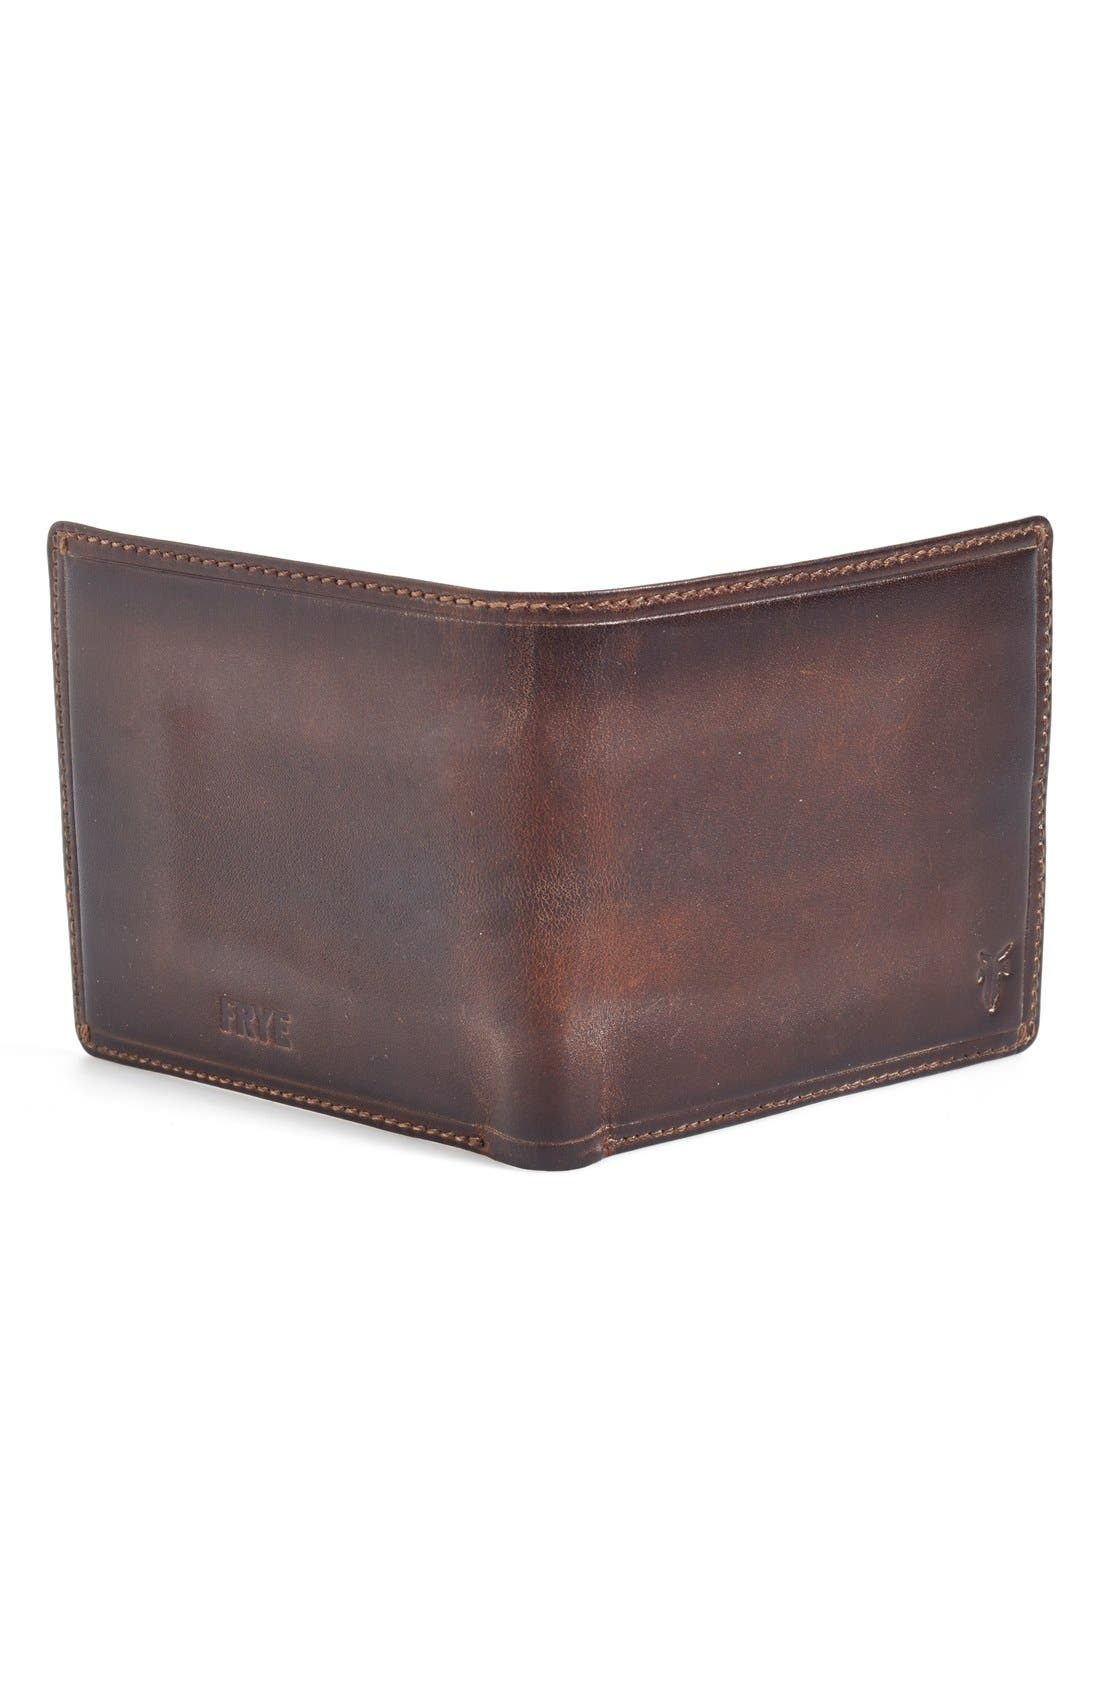 FRYE, 'Logan' Leather Billfold Wallet, Alternate thumbnail 2, color, SLATE